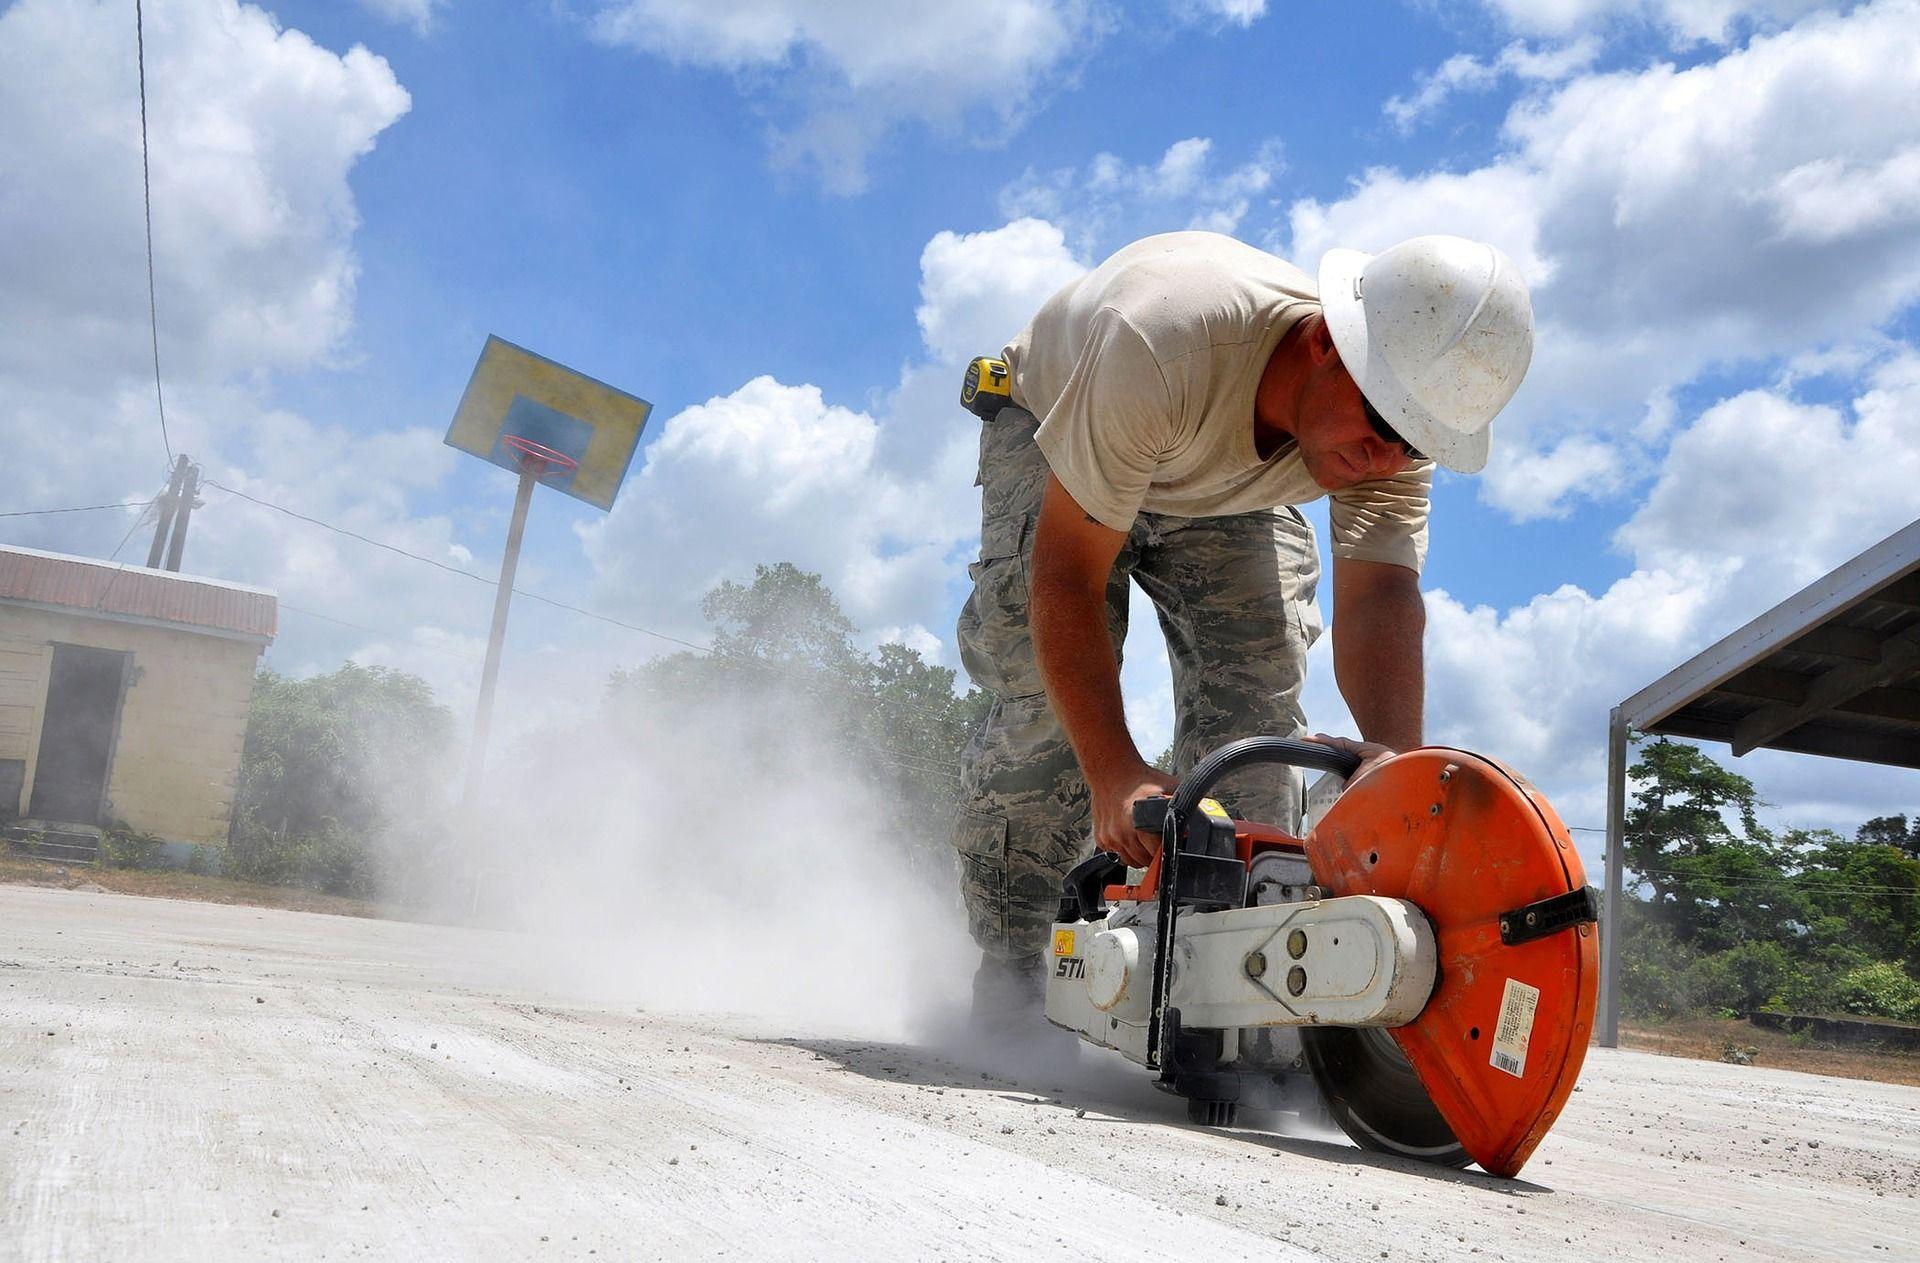 Sthil Hurricane Blade Win In 2020 Concrete Saw Types Of Concrete Concrete Contractor